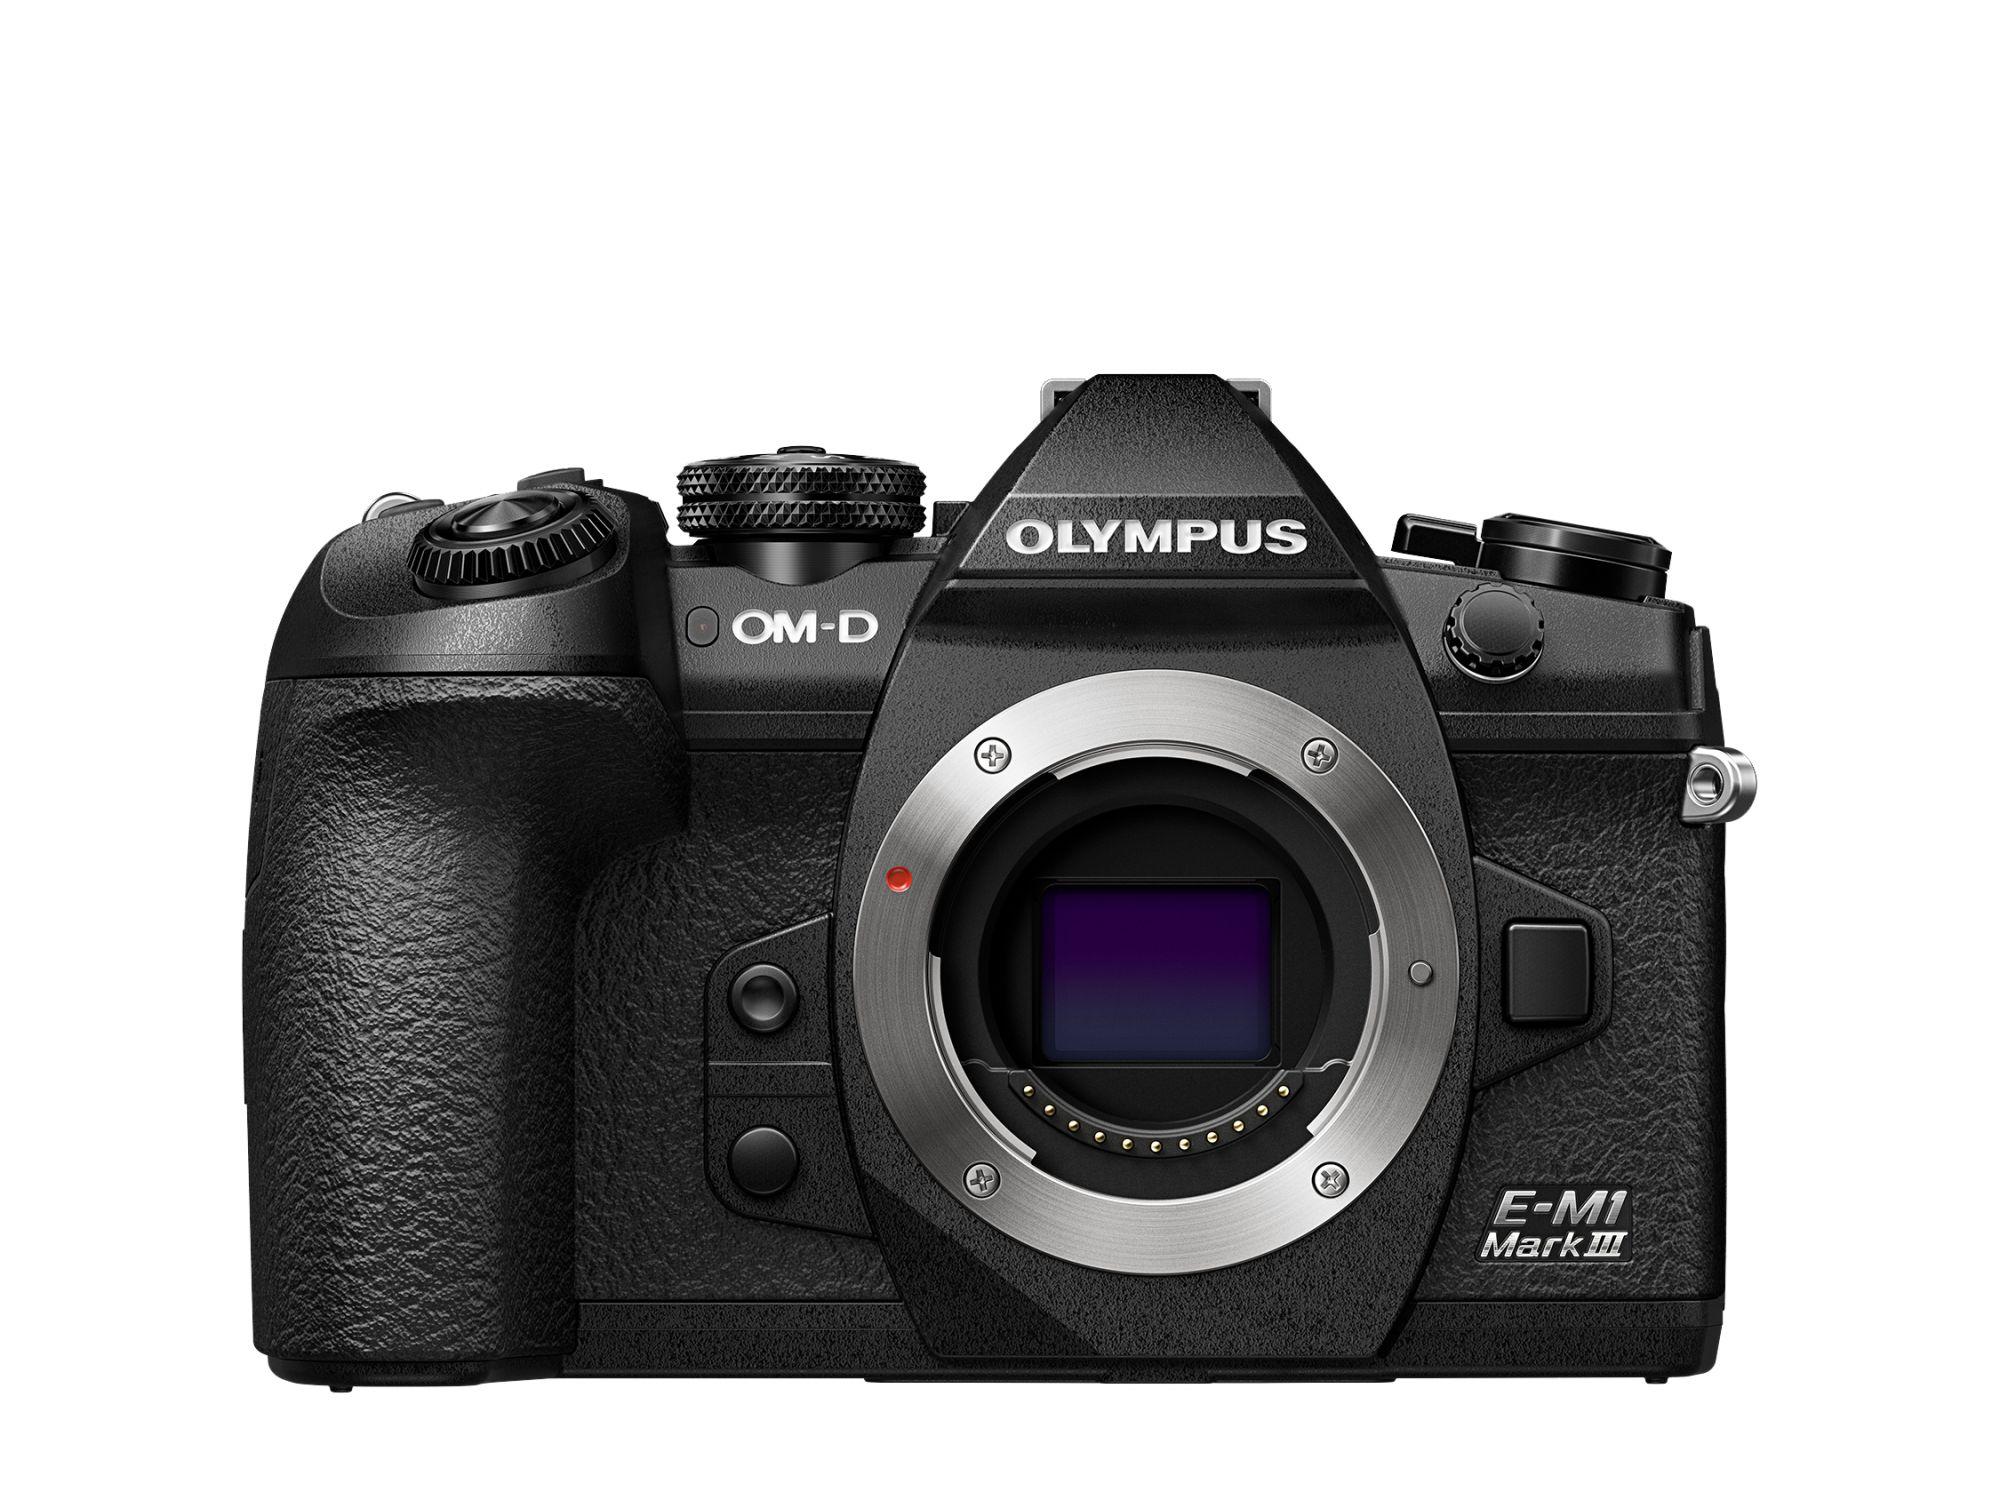 Olympus OM-D E-M1 Mark III nu